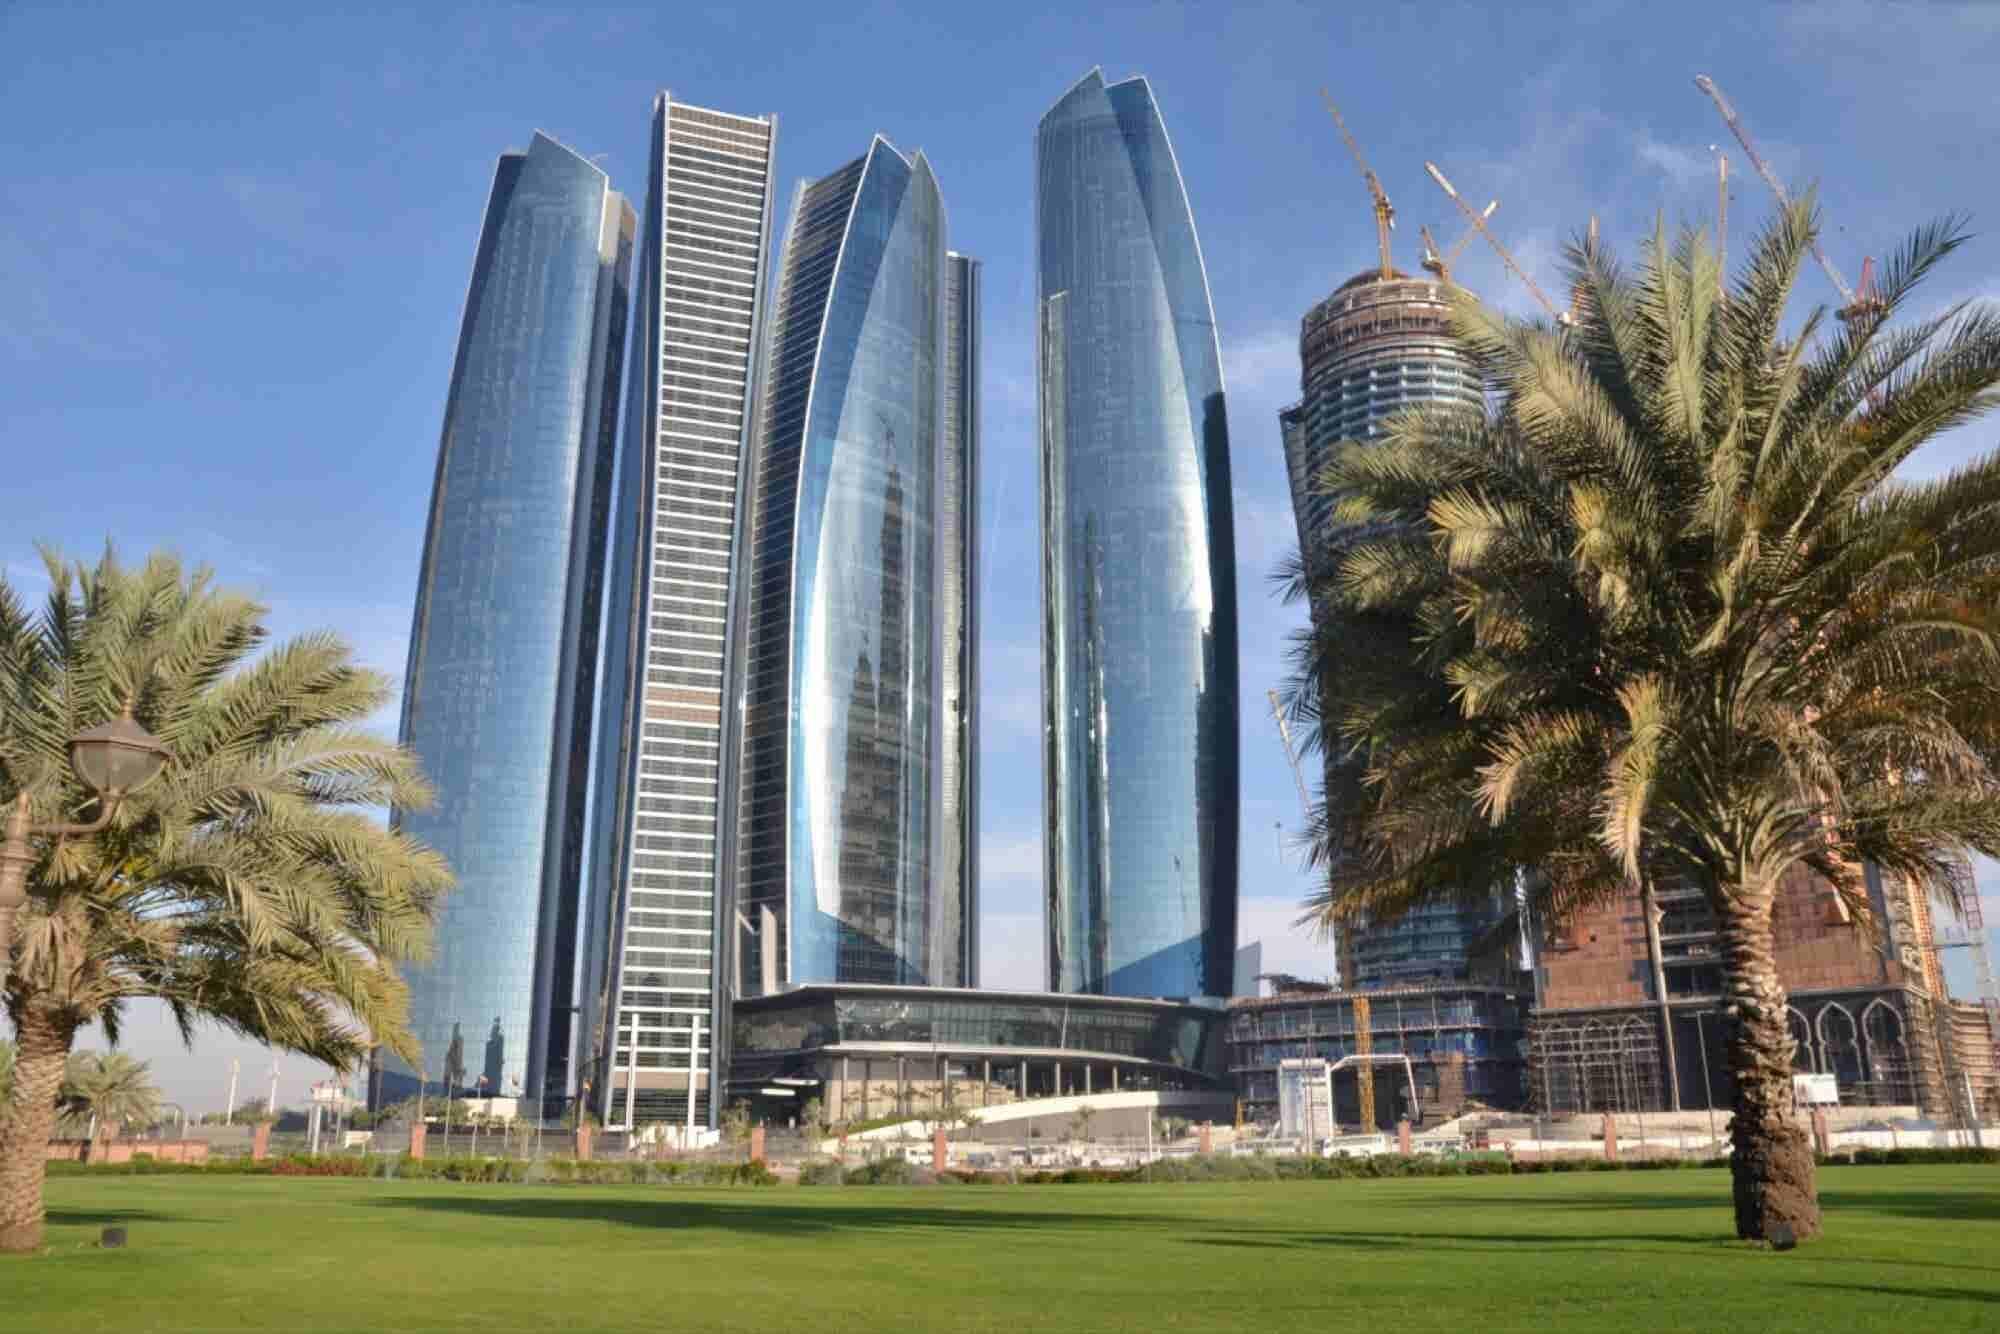 Abu Dhabi's Mubadala To Become Biggest Shareholder In Bahrain's Investcorp